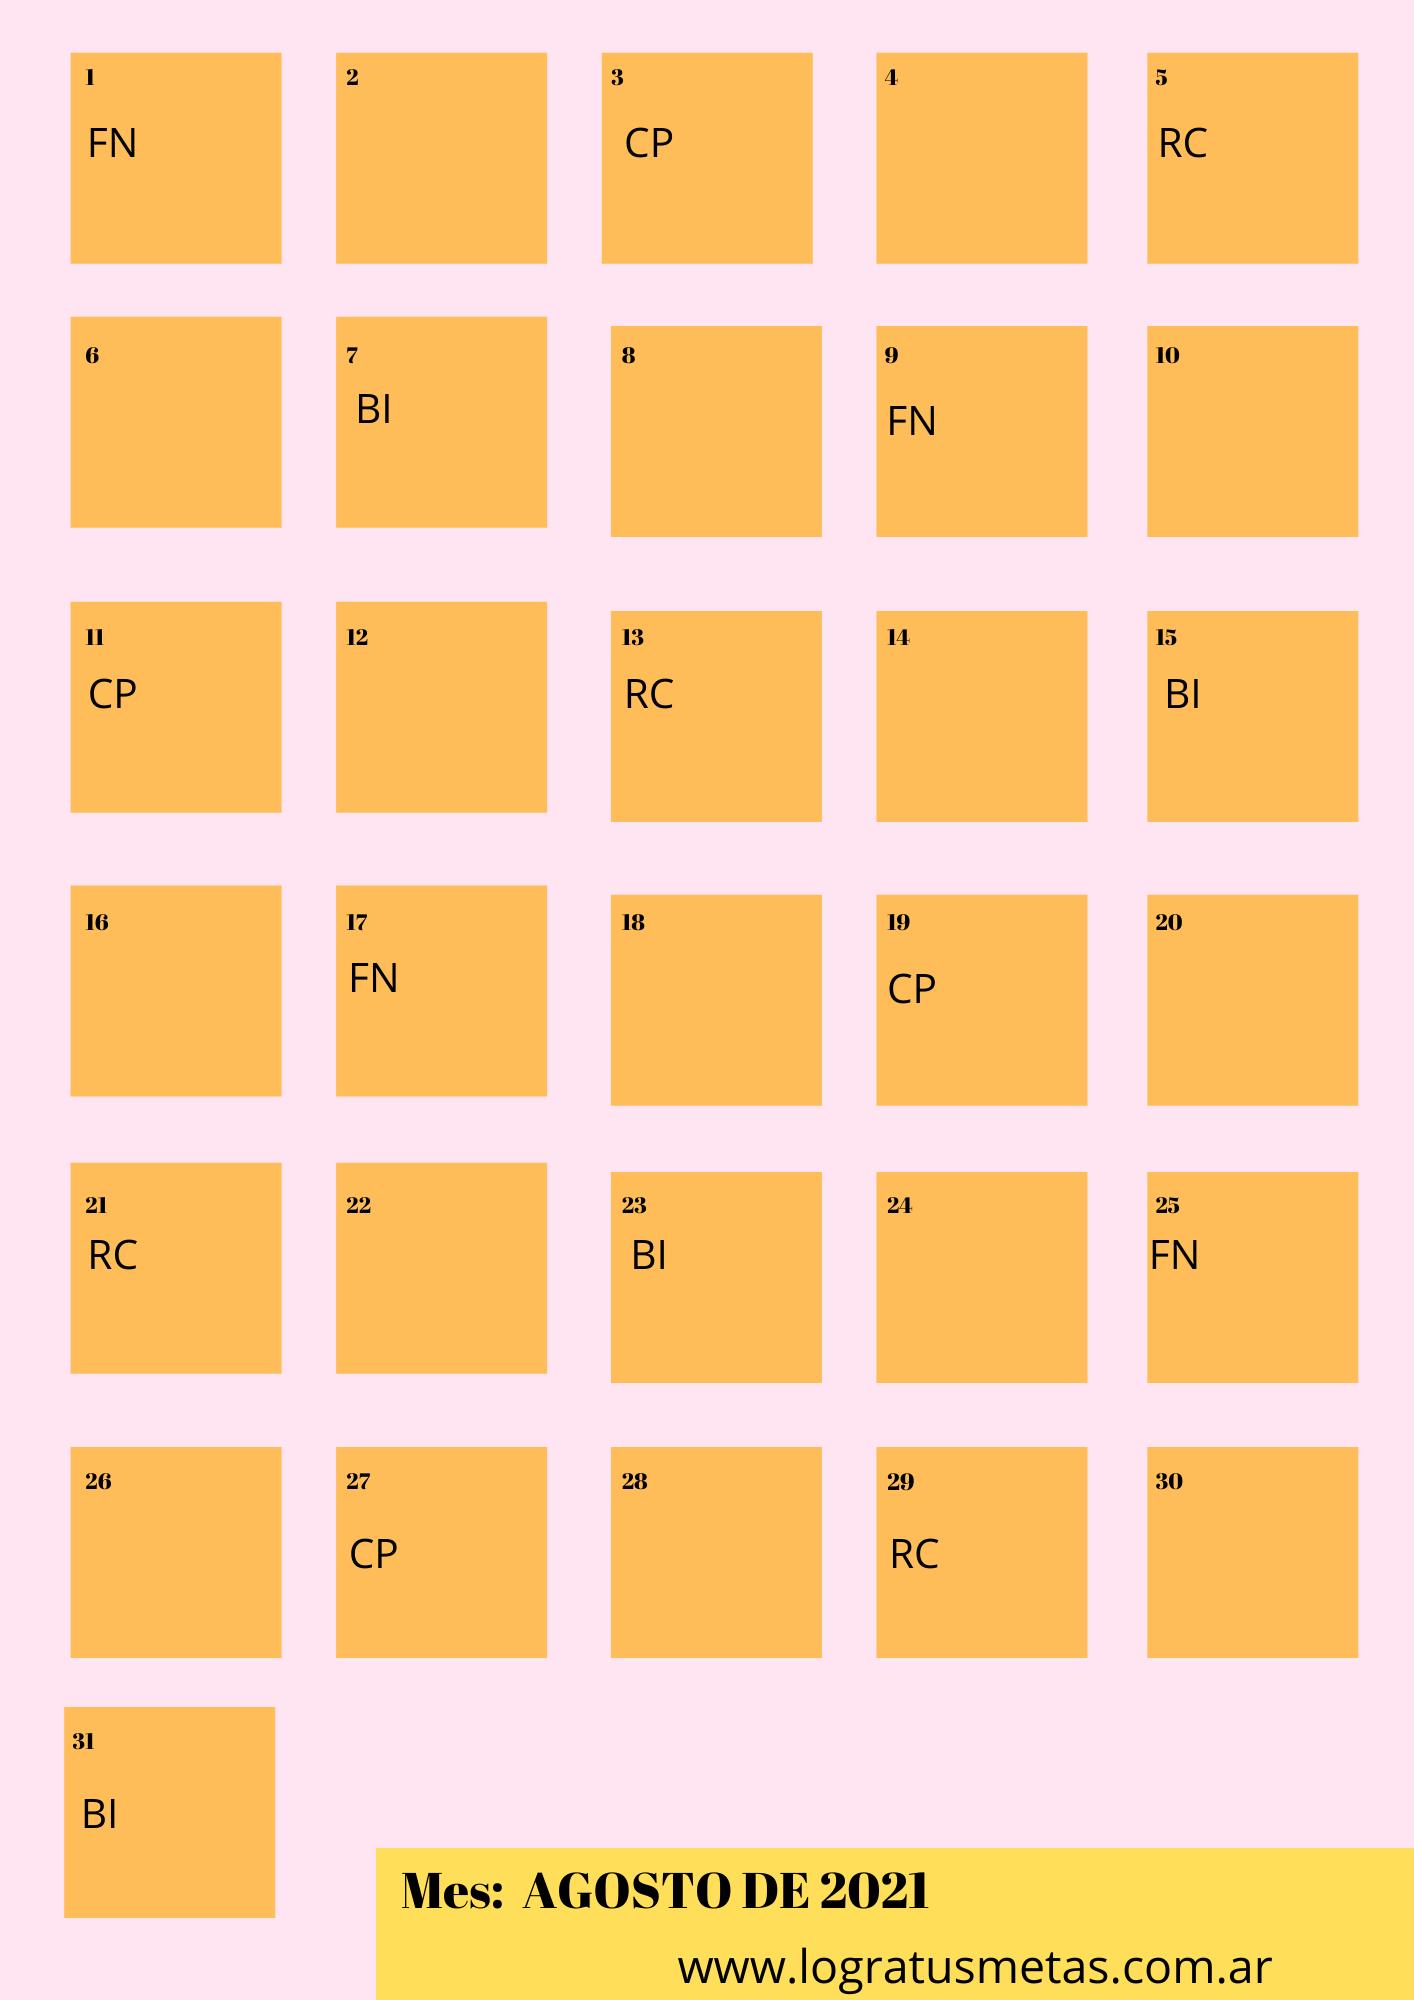 imagen nº3 método súper efectivo para organizarte